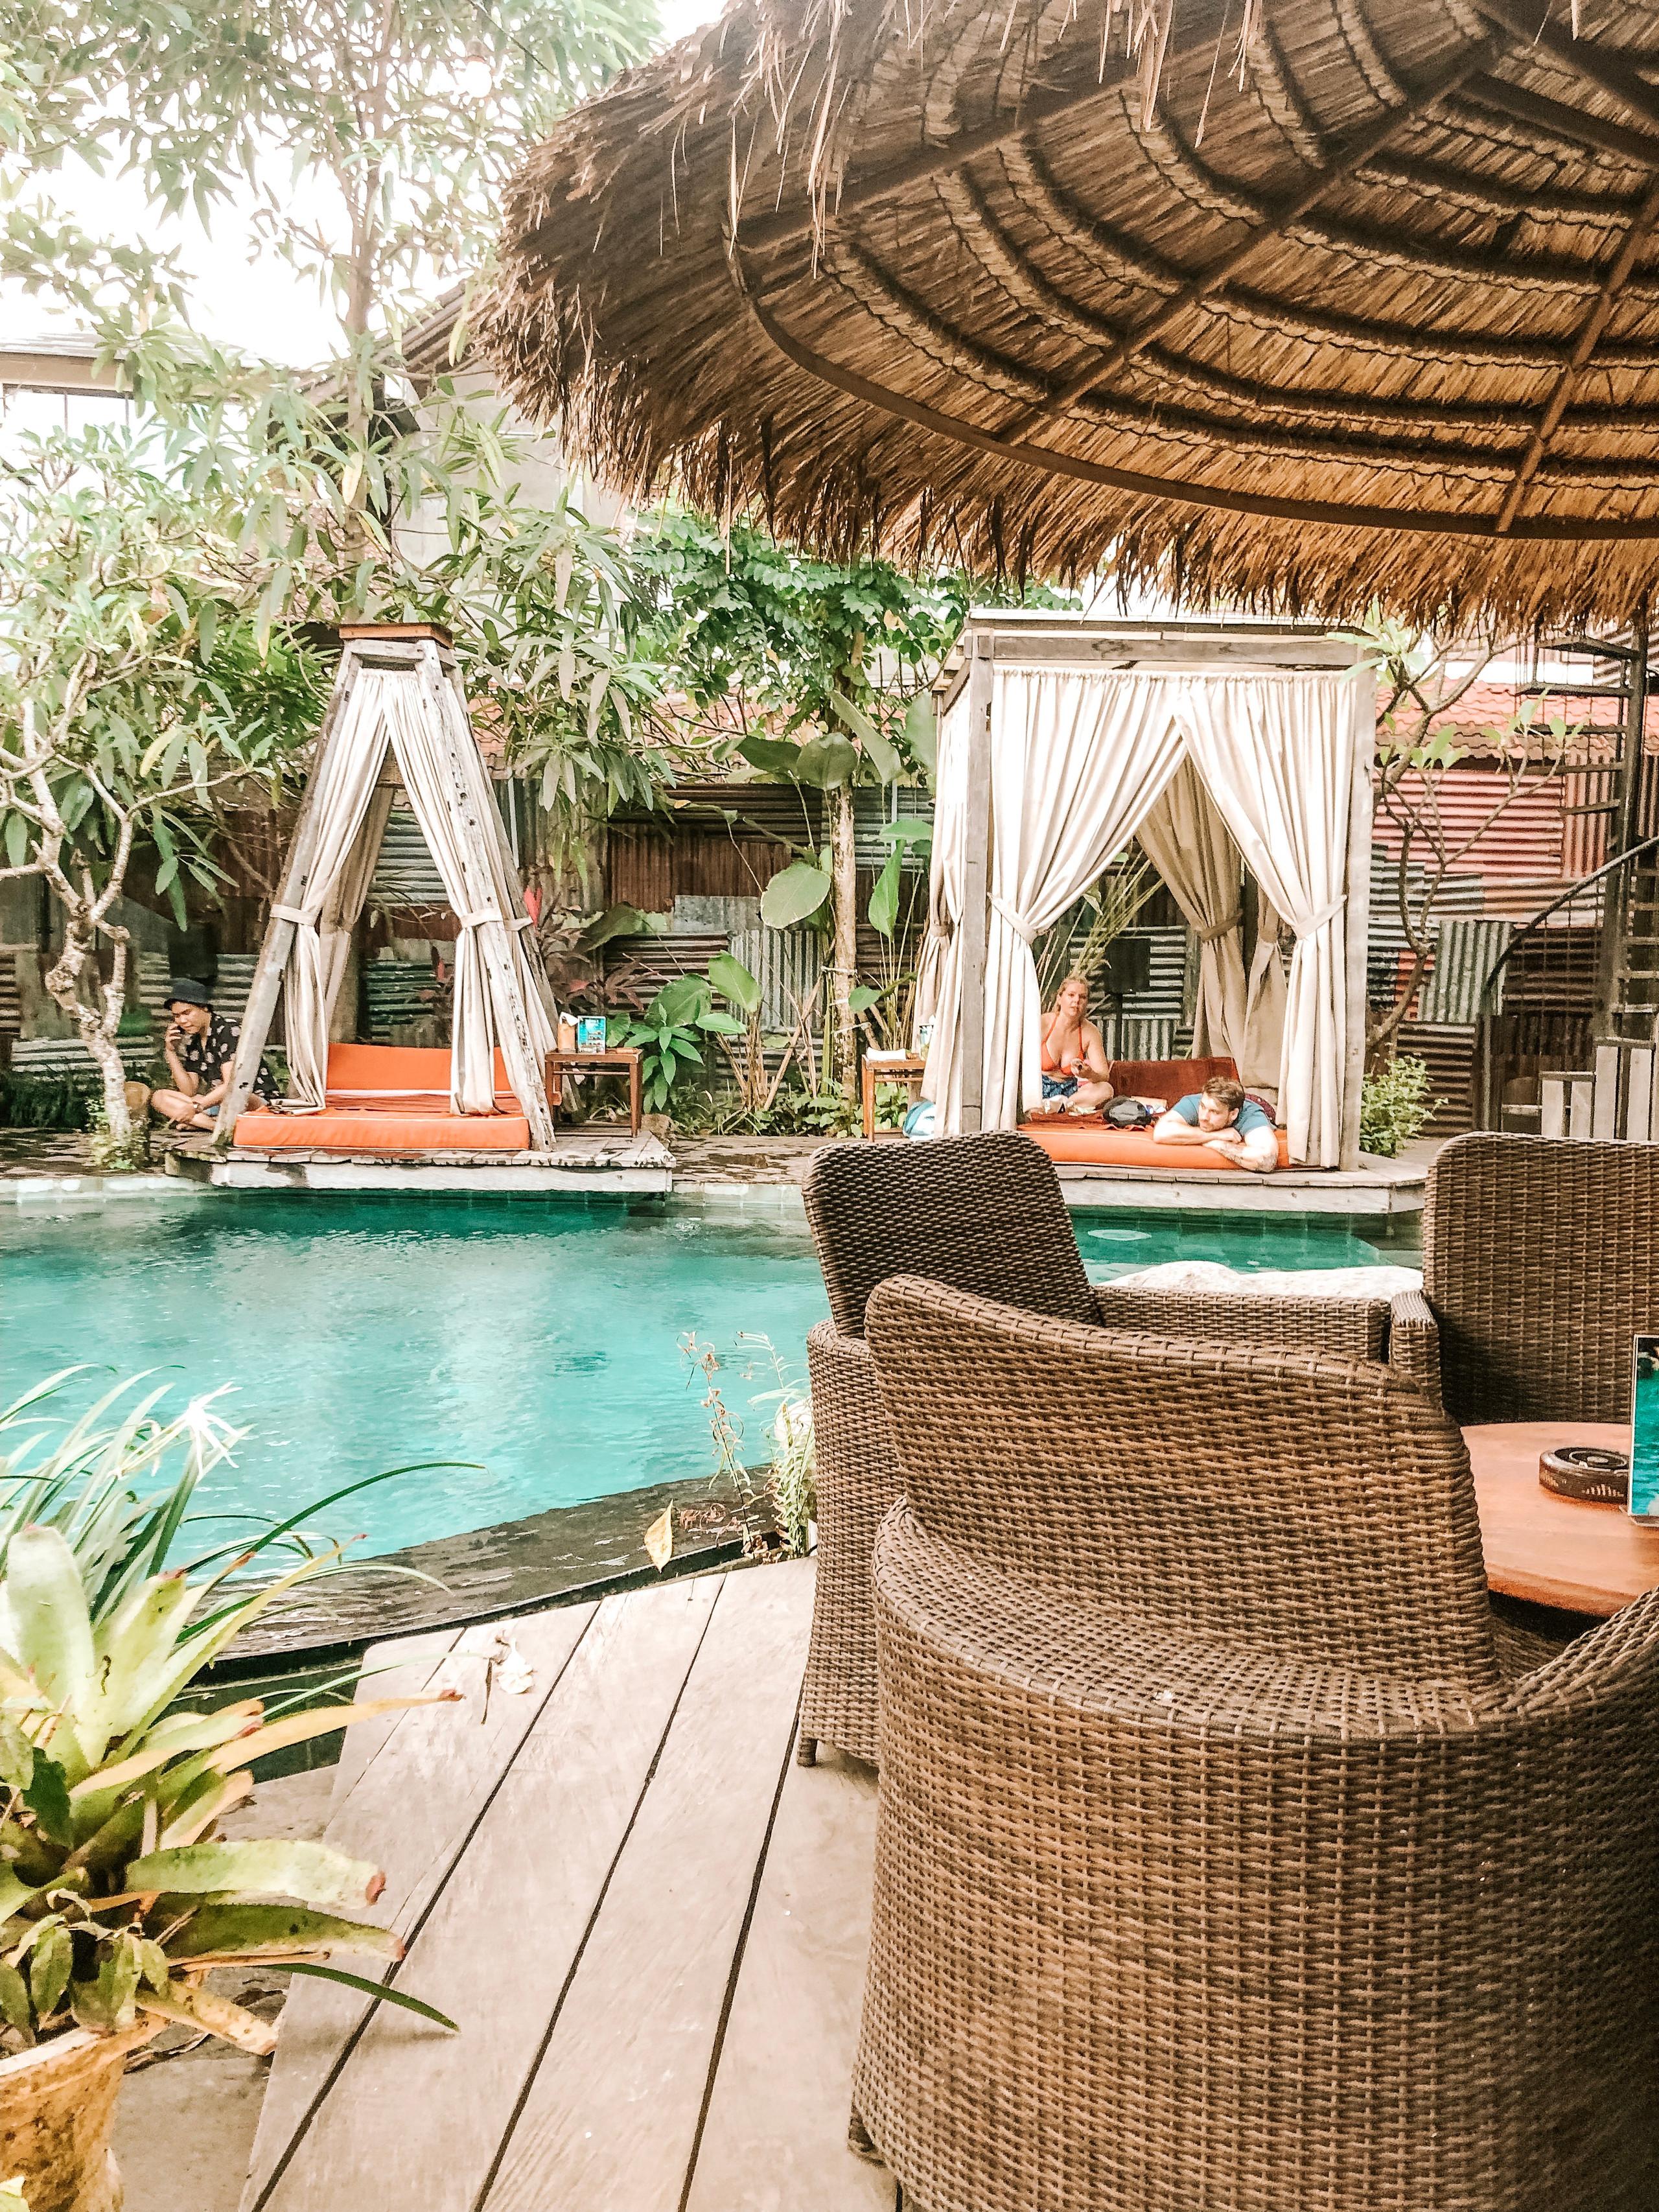 Folk Pool Bar Bali travel guide review blog Ubud Indonesia